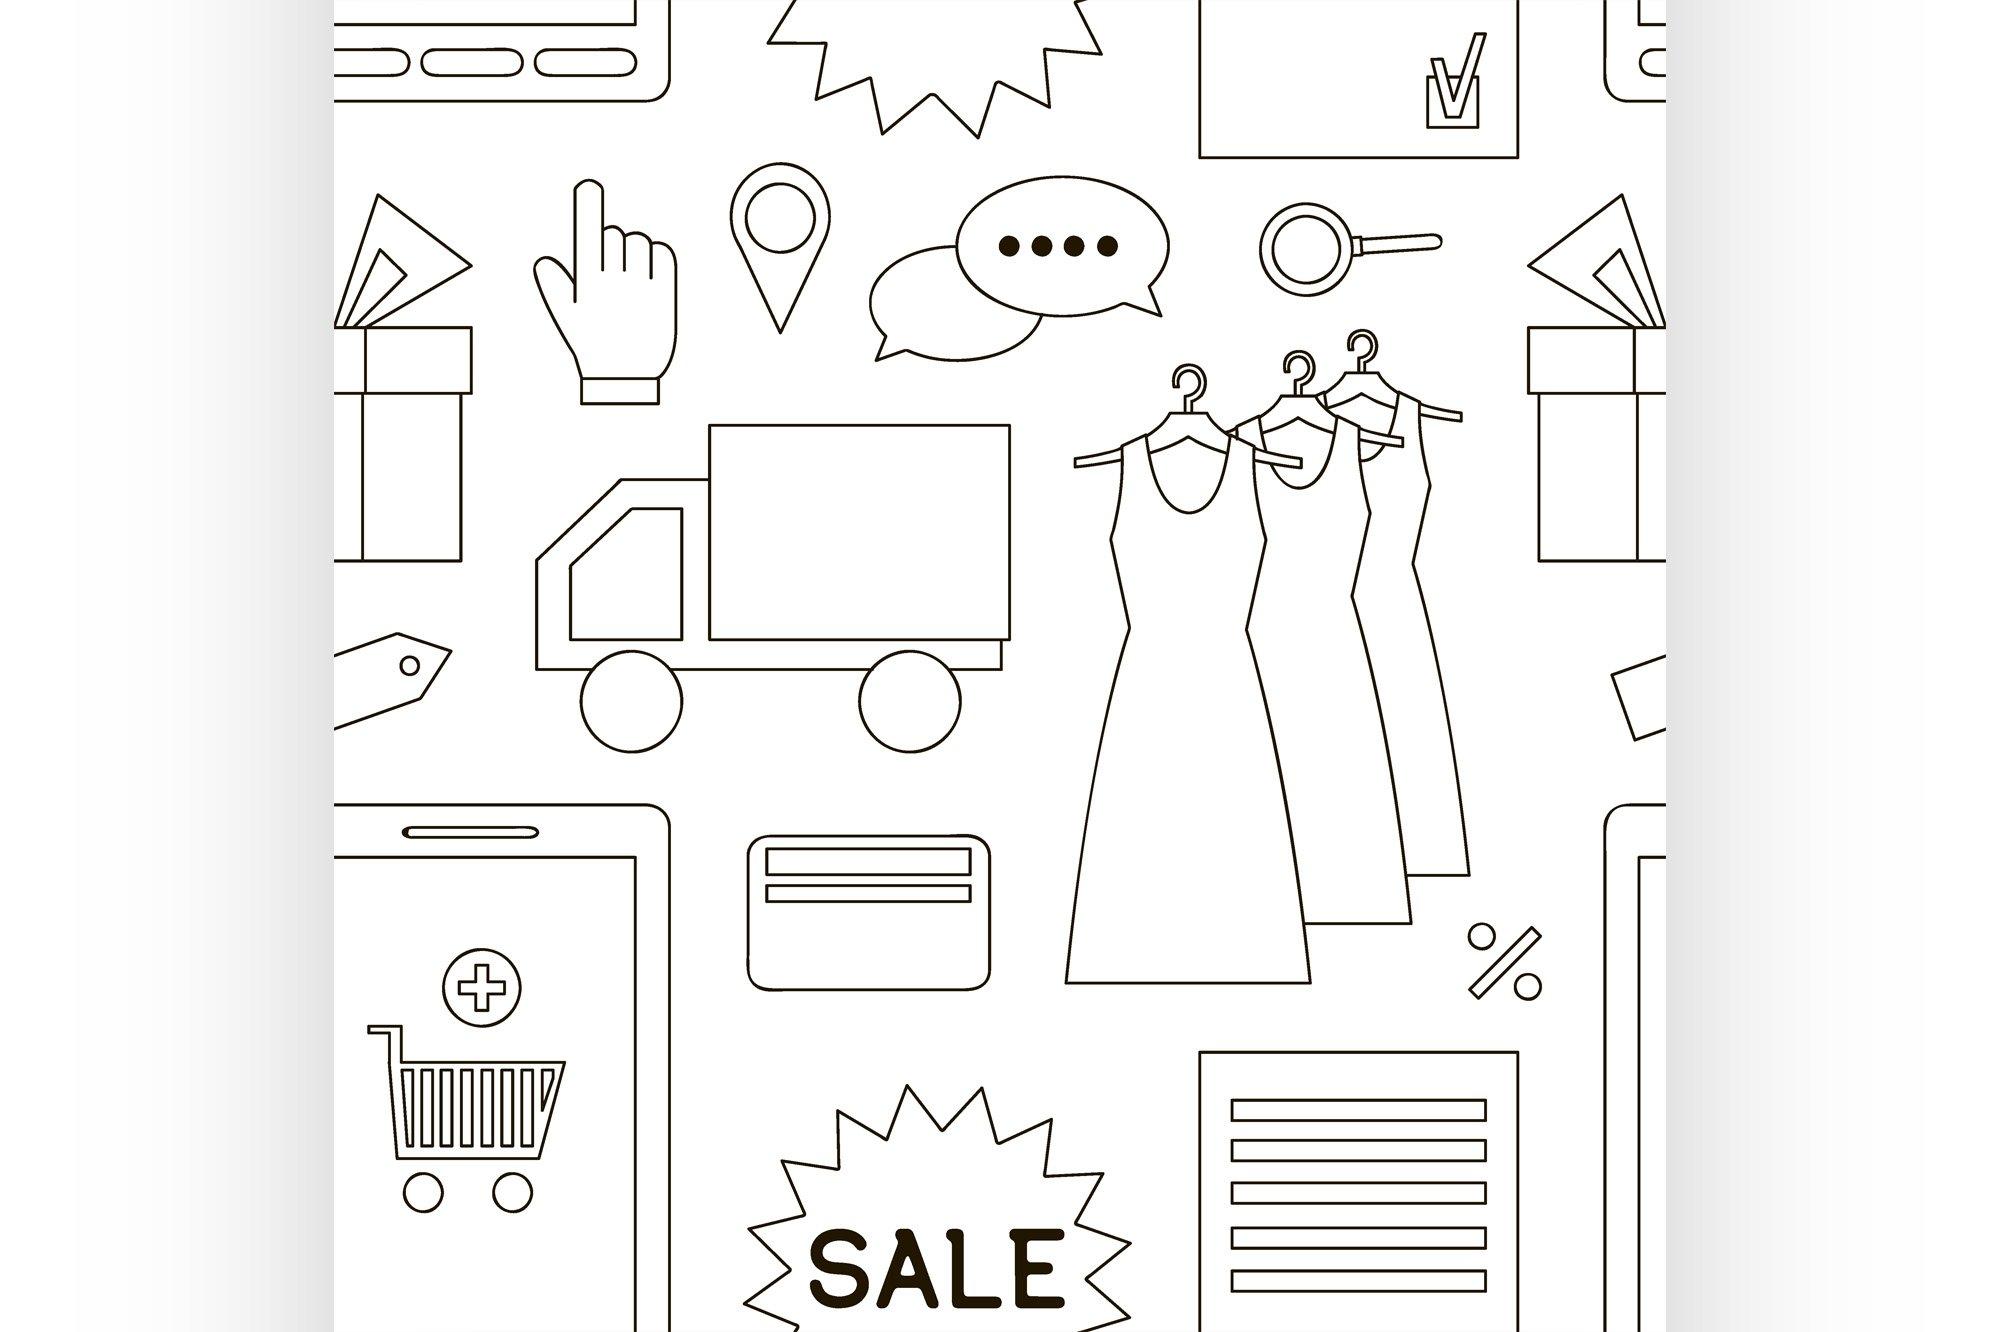 Online shopping set pattern example image 1